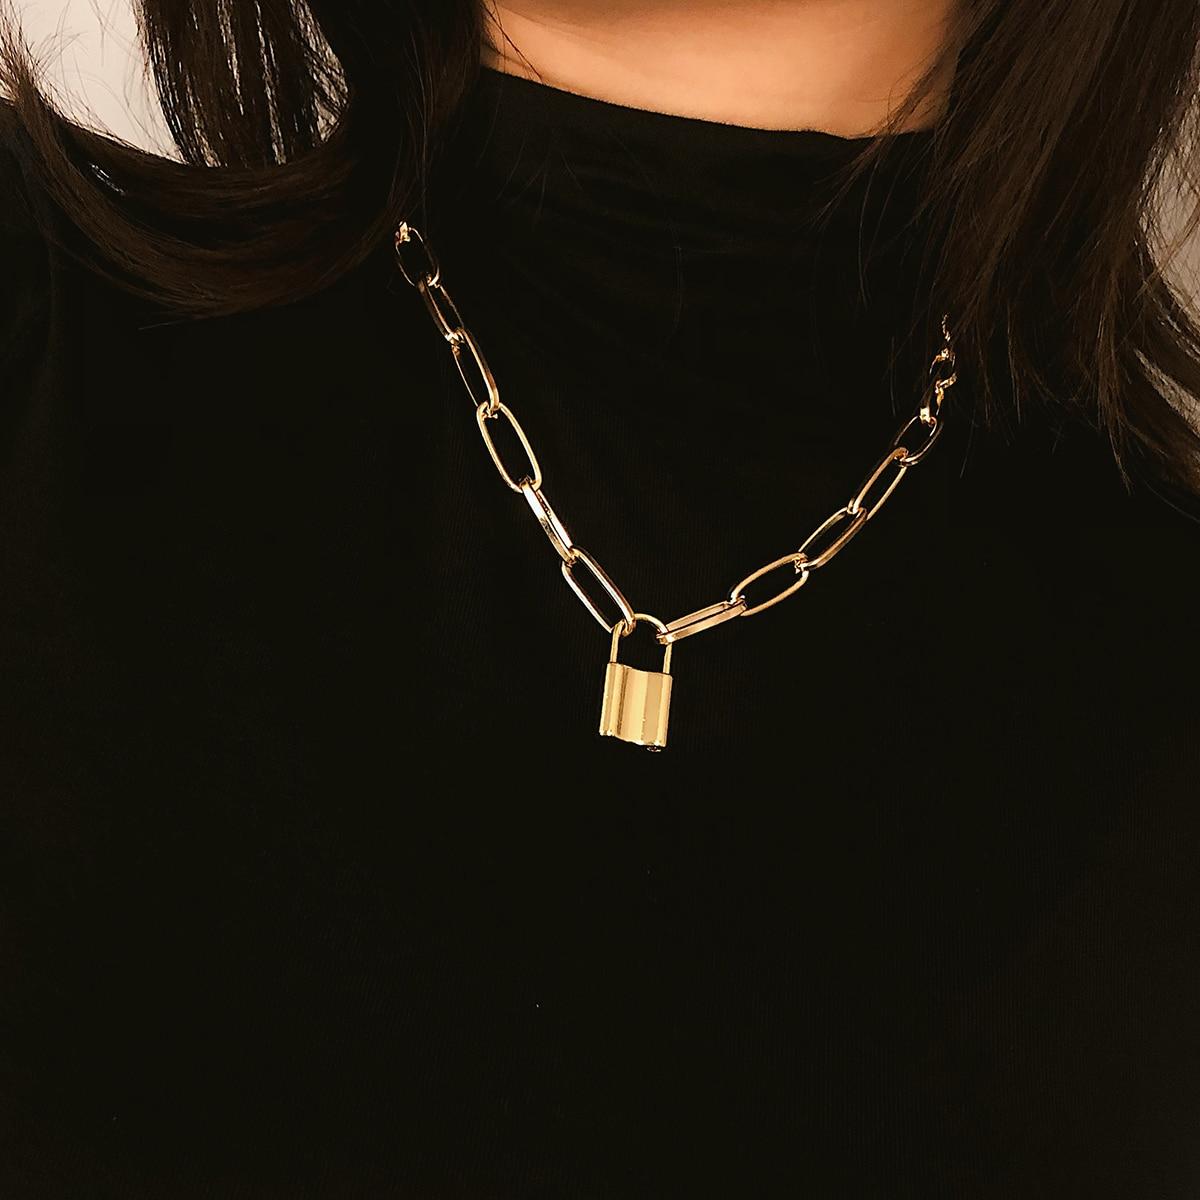 Collar de cadena gruesa con candado único de verano, collar con colgante de roca, gargantilla de candado, collar con cadena en capas en el cuello con